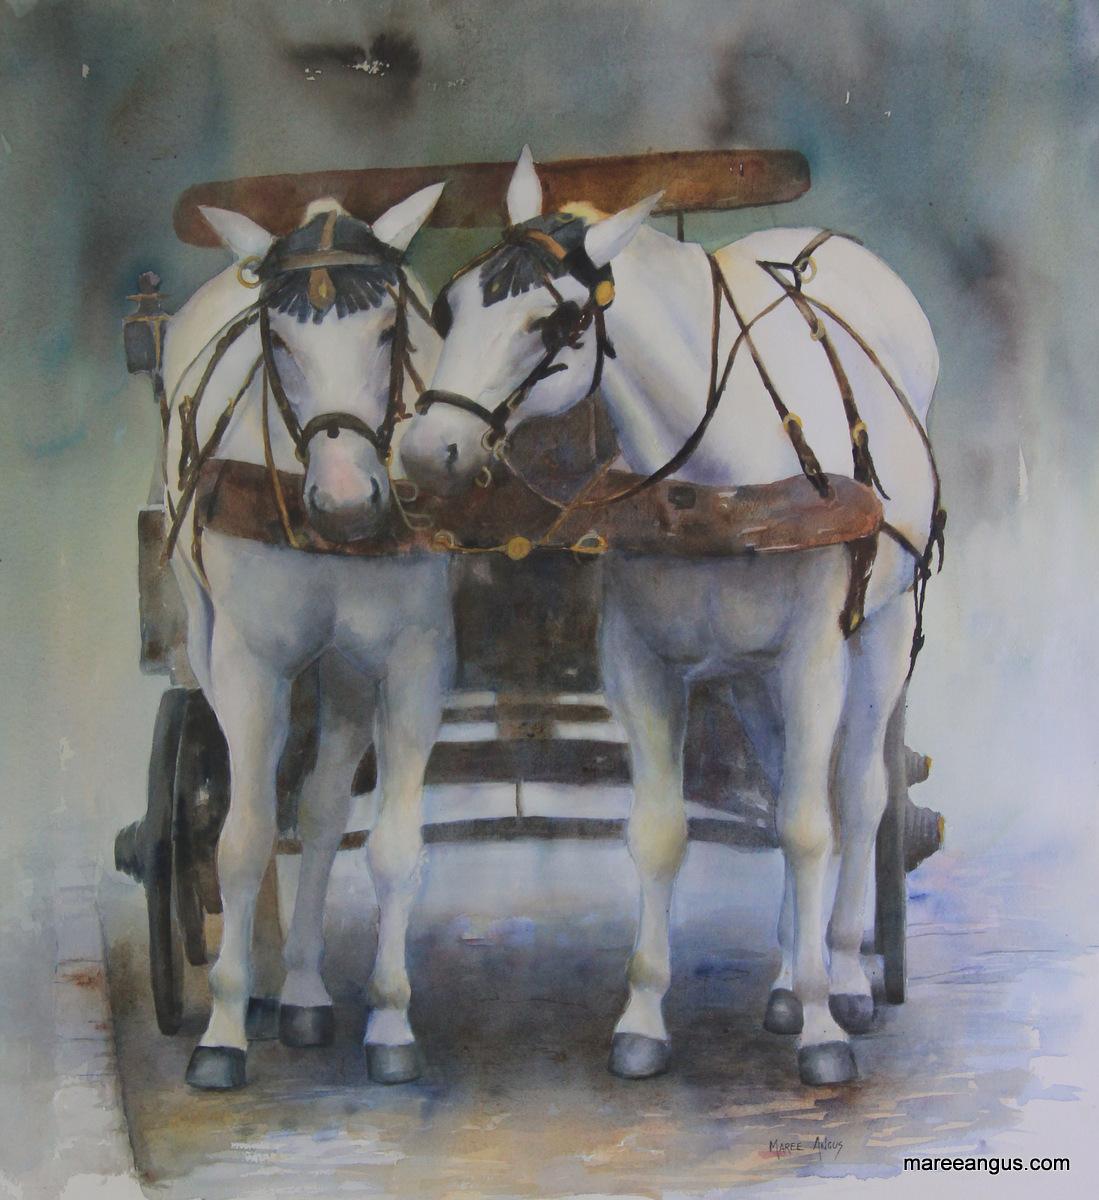 Oats for Dinner Tonight! - 58cm x 53cm, Watercolour - $1750